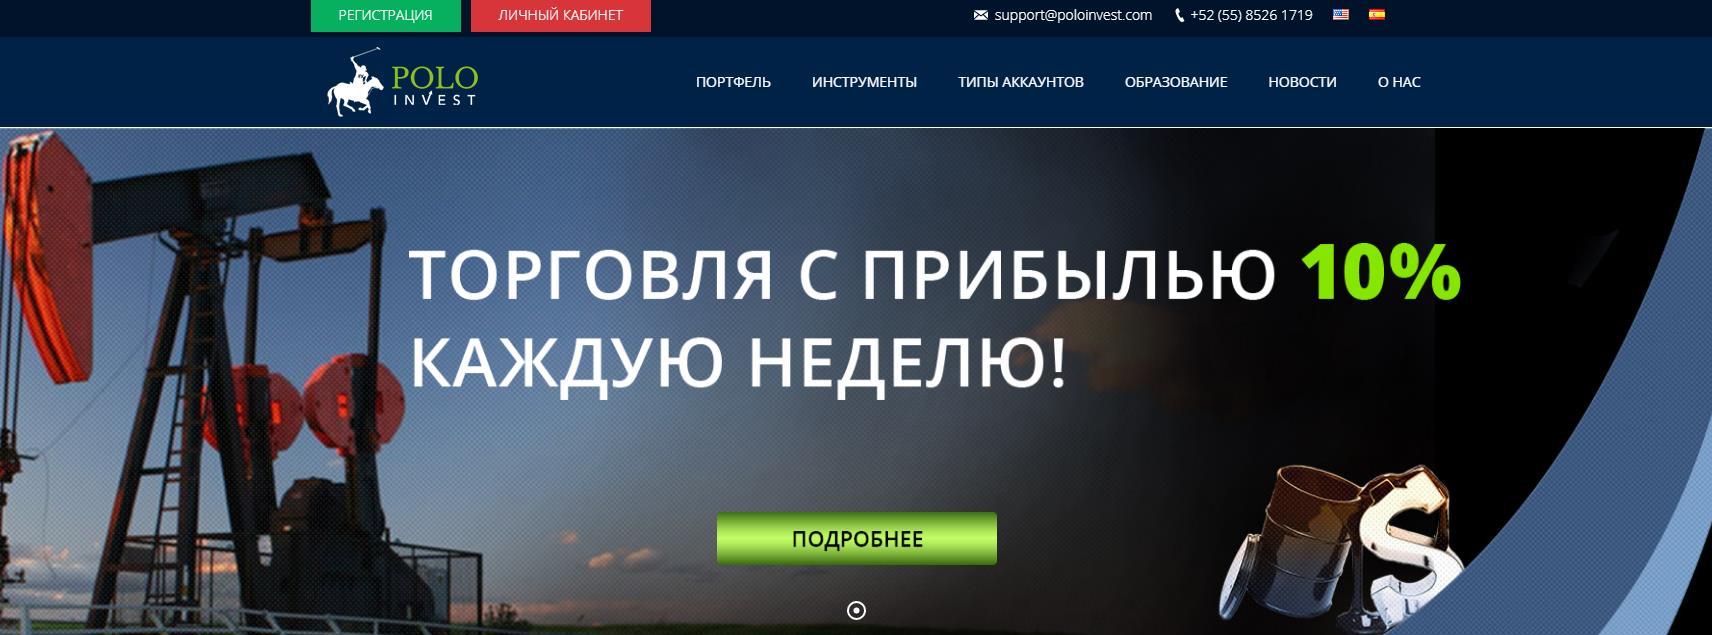 обзор компании poloinvest